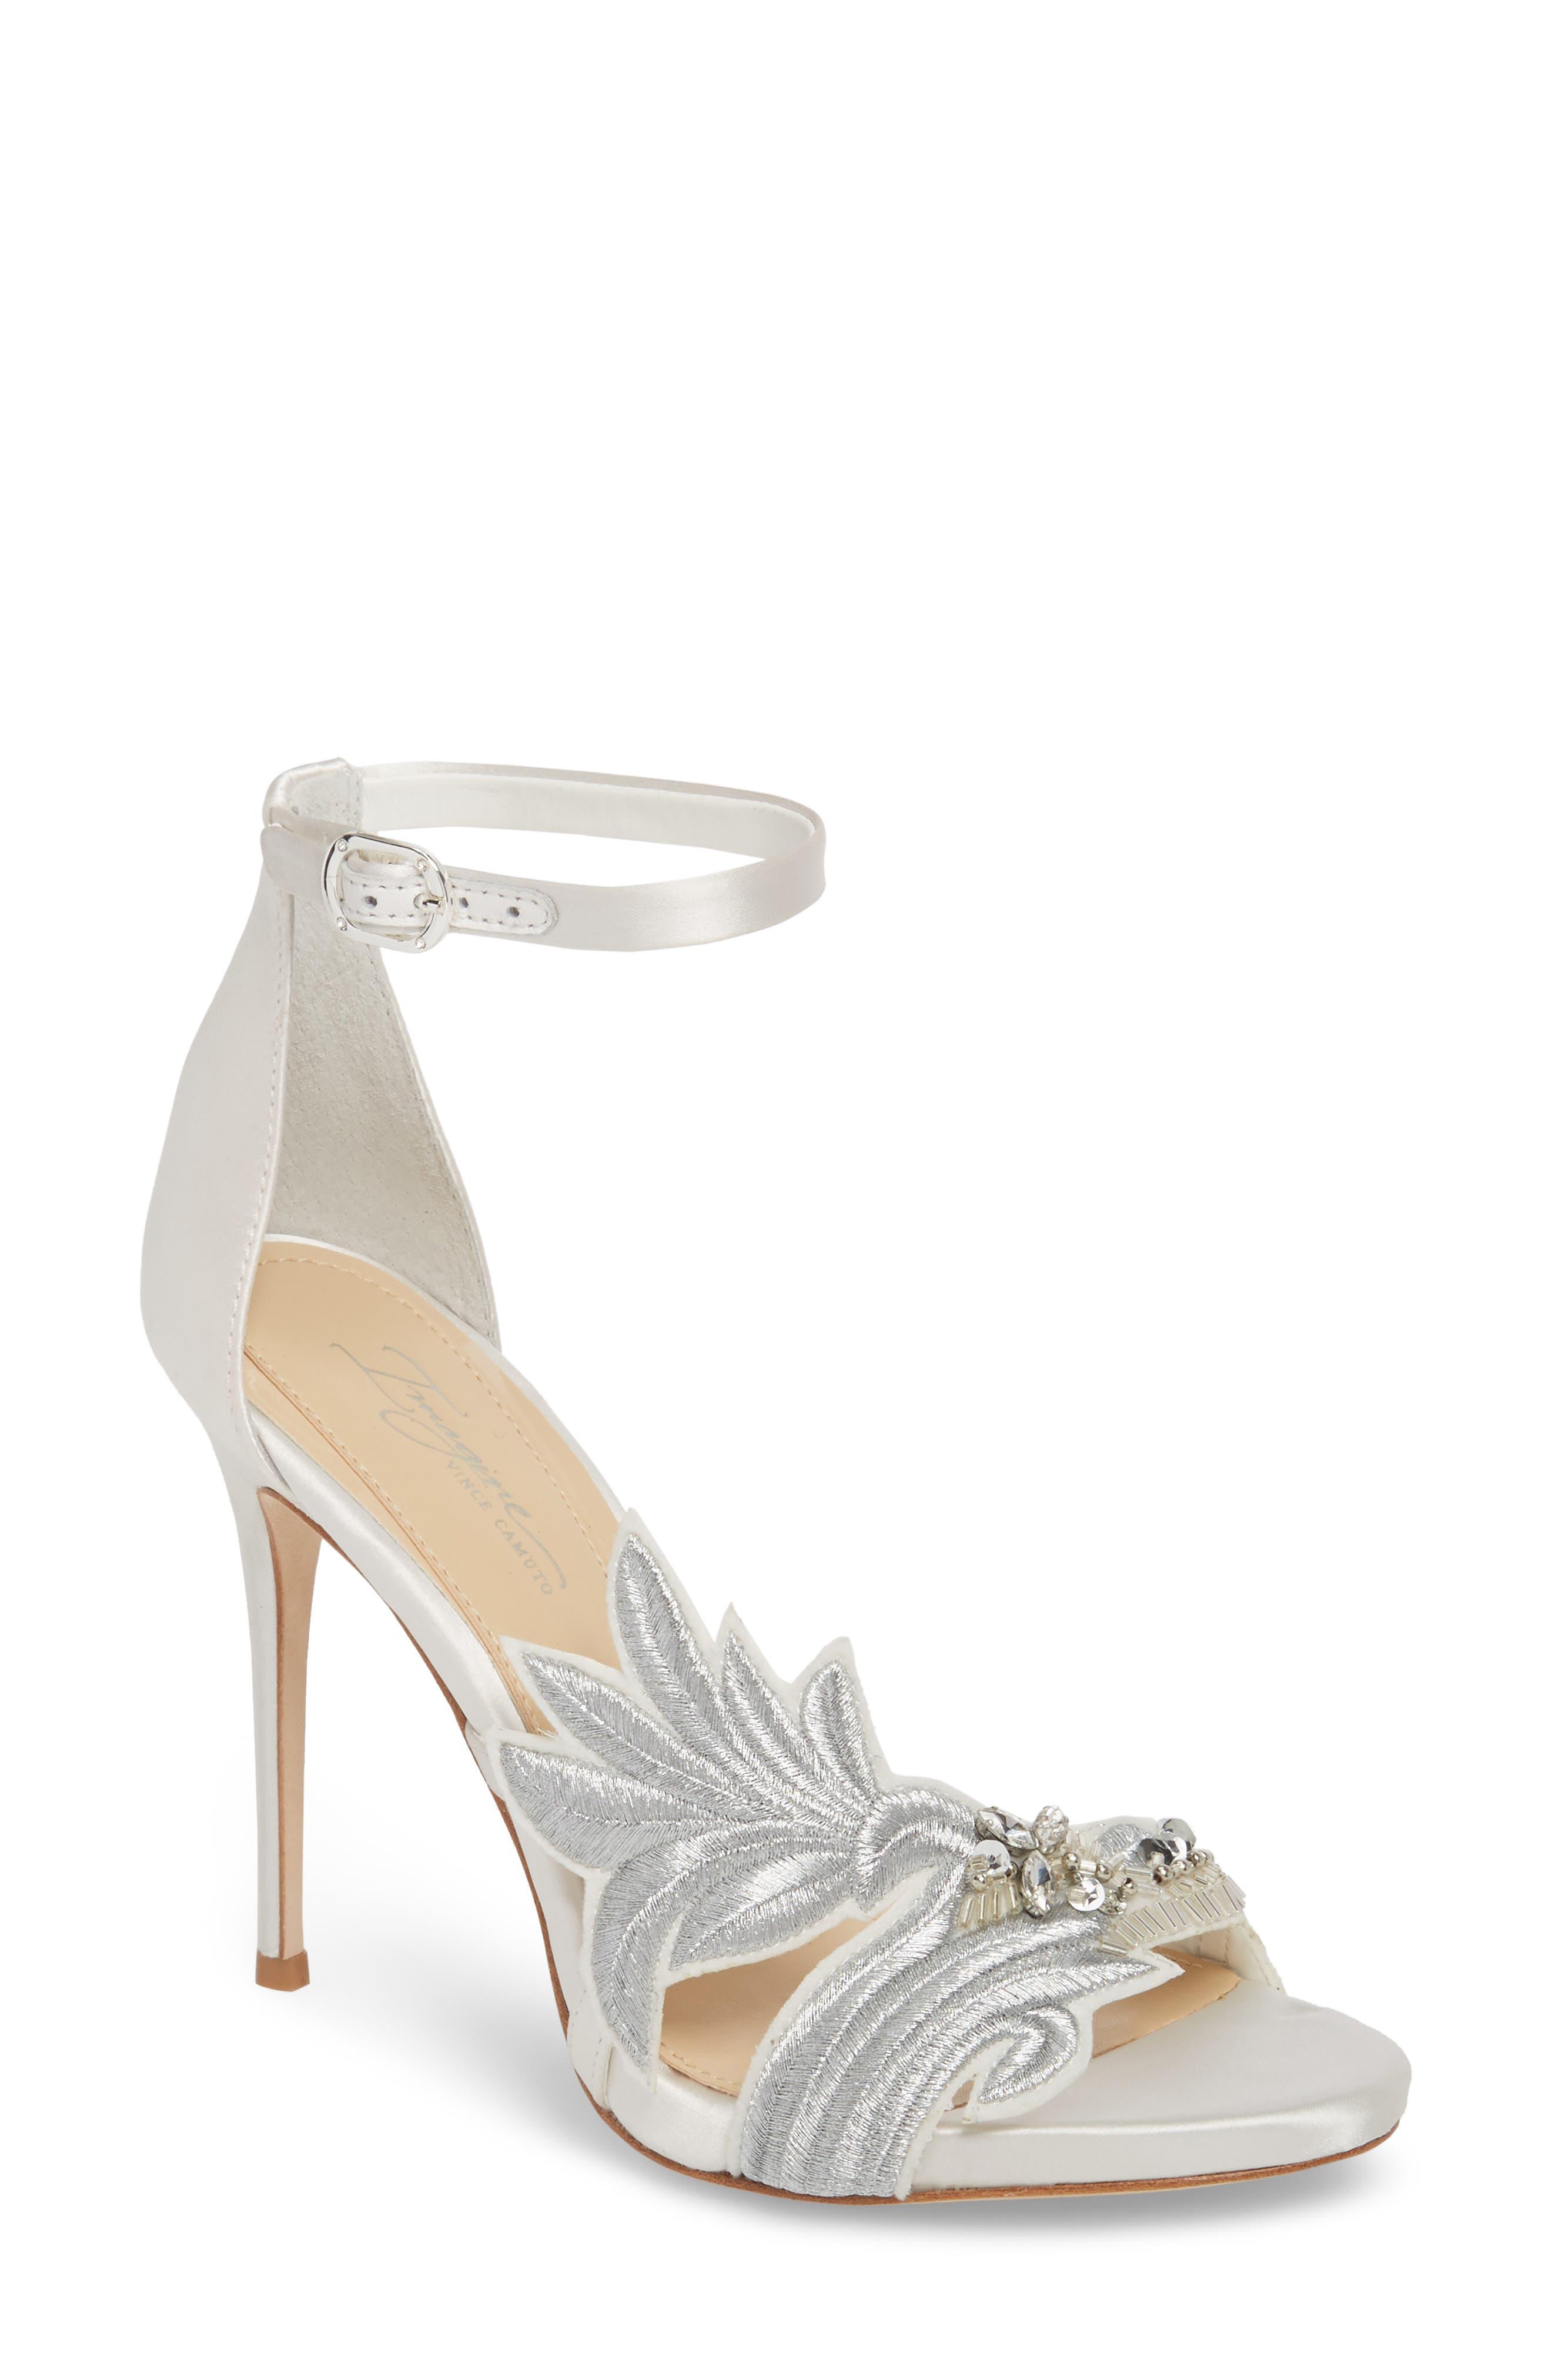 Imagine Vince Camuto Dayanara Embellished Sandal,                         Main,                         color, PURE WHITE SATIN